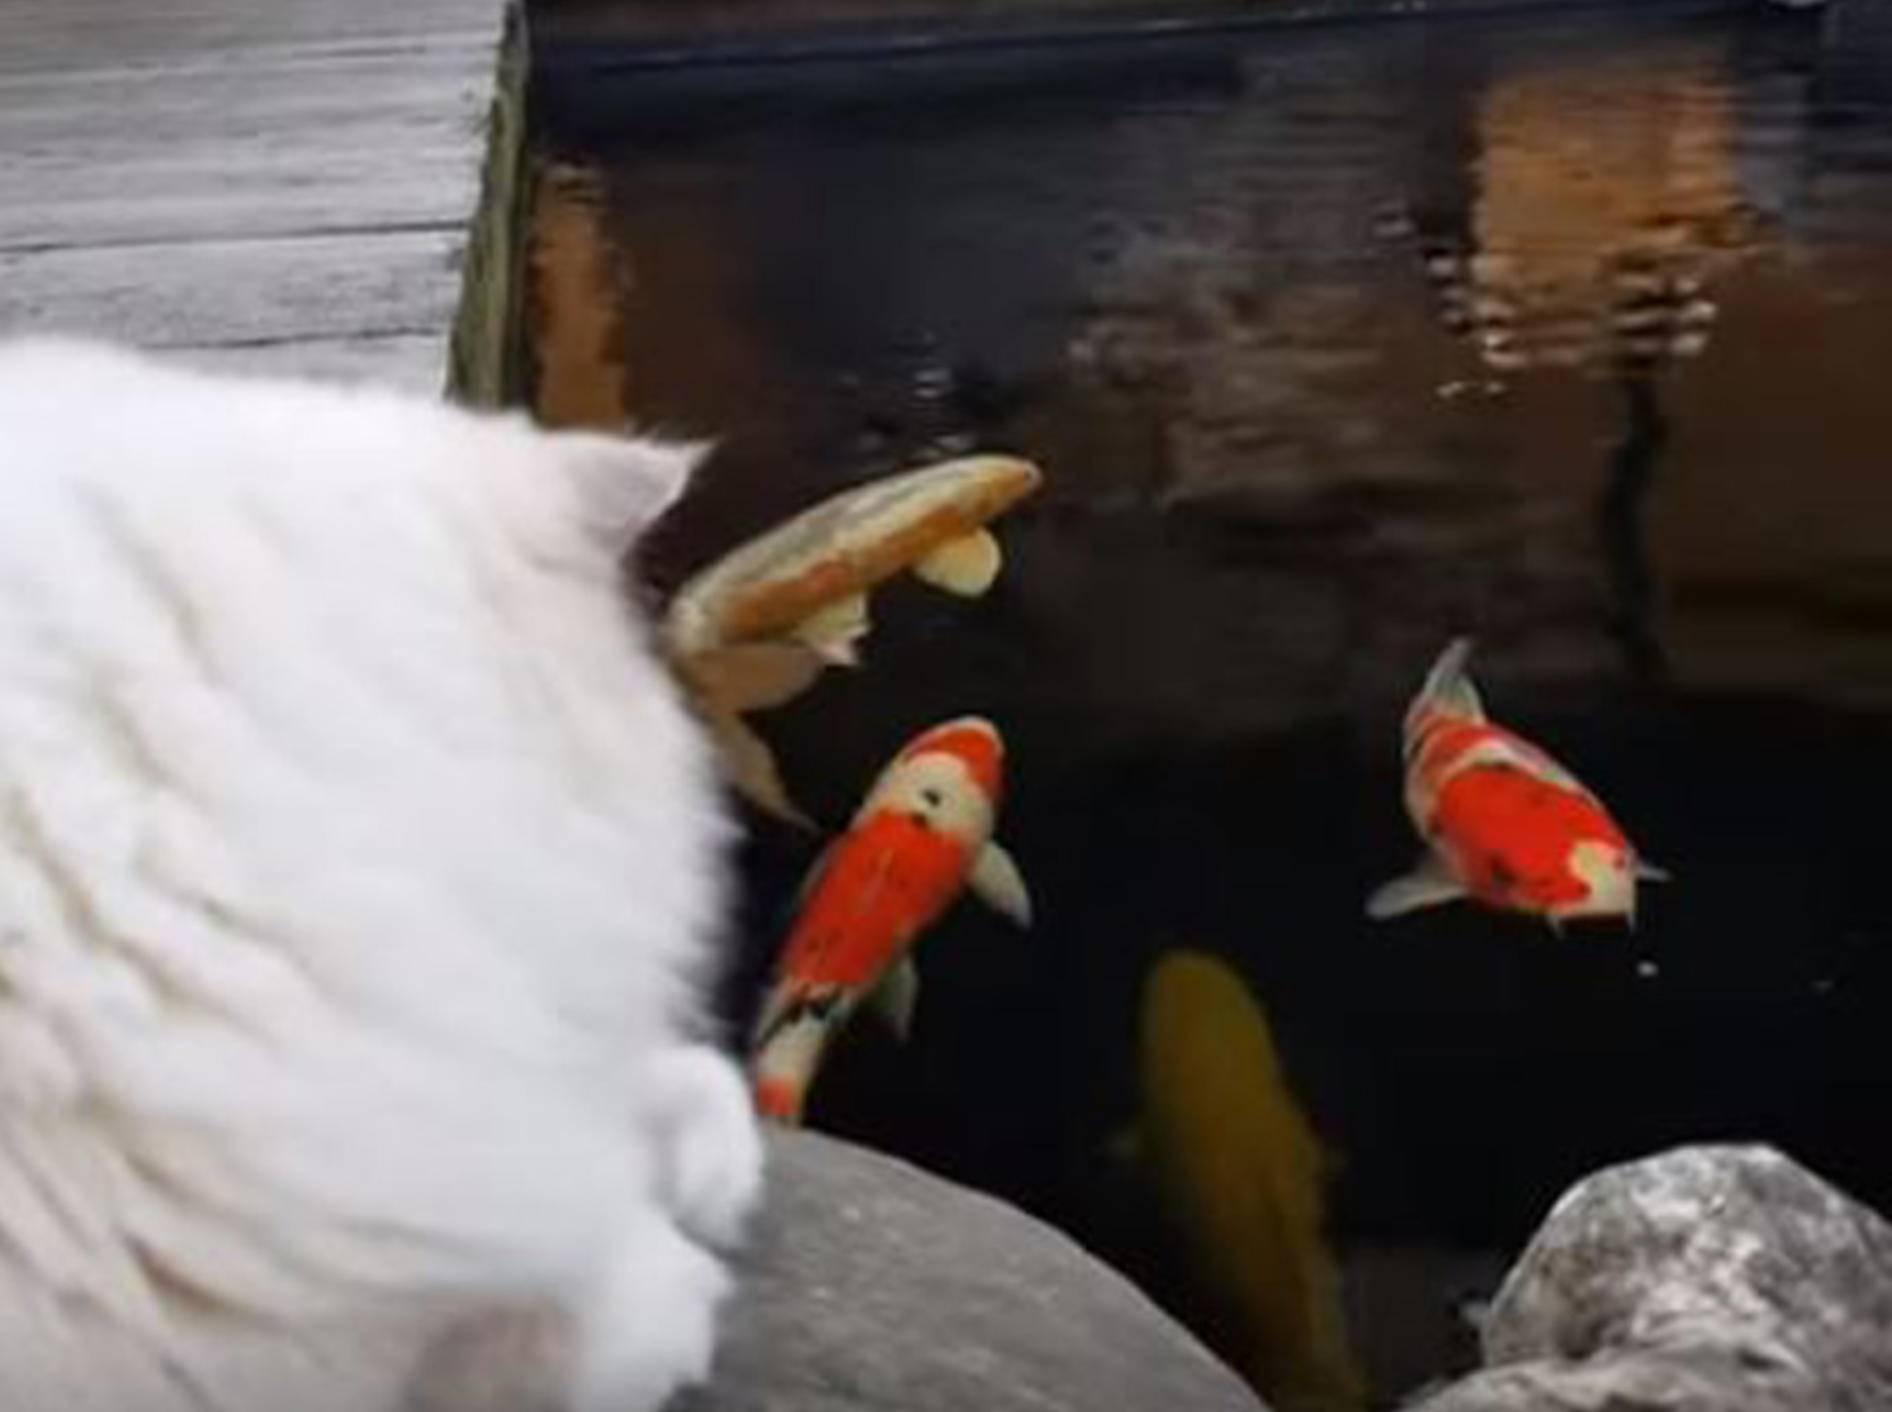 Ragdoll Toby beobachtet Koi-Fische - Bild: YouTube /Xiedubbel